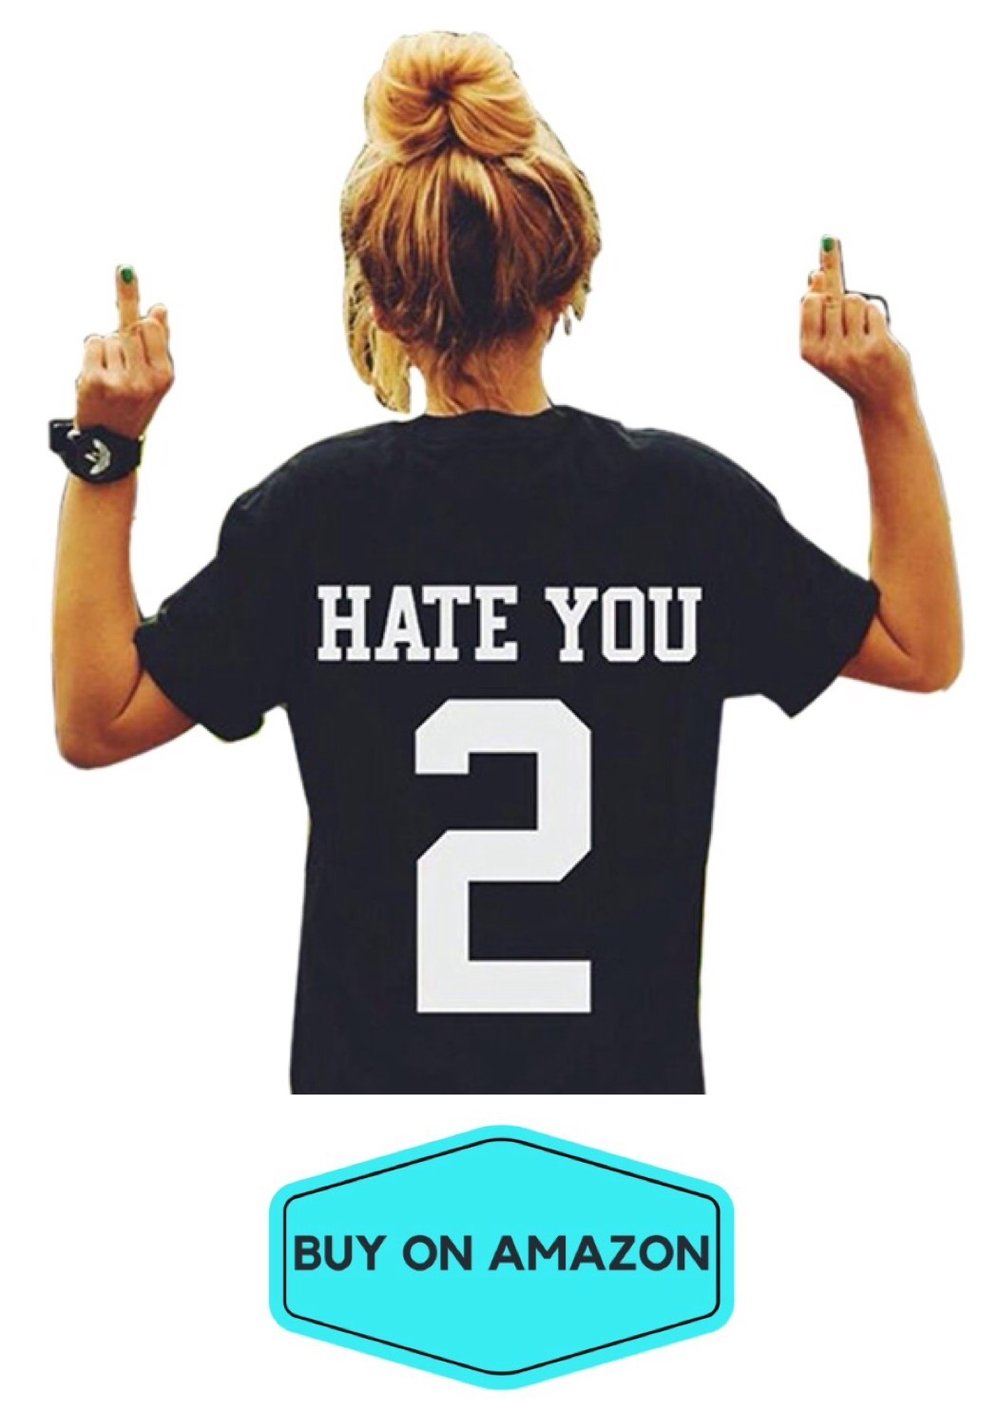 I Hate You 2 Tee